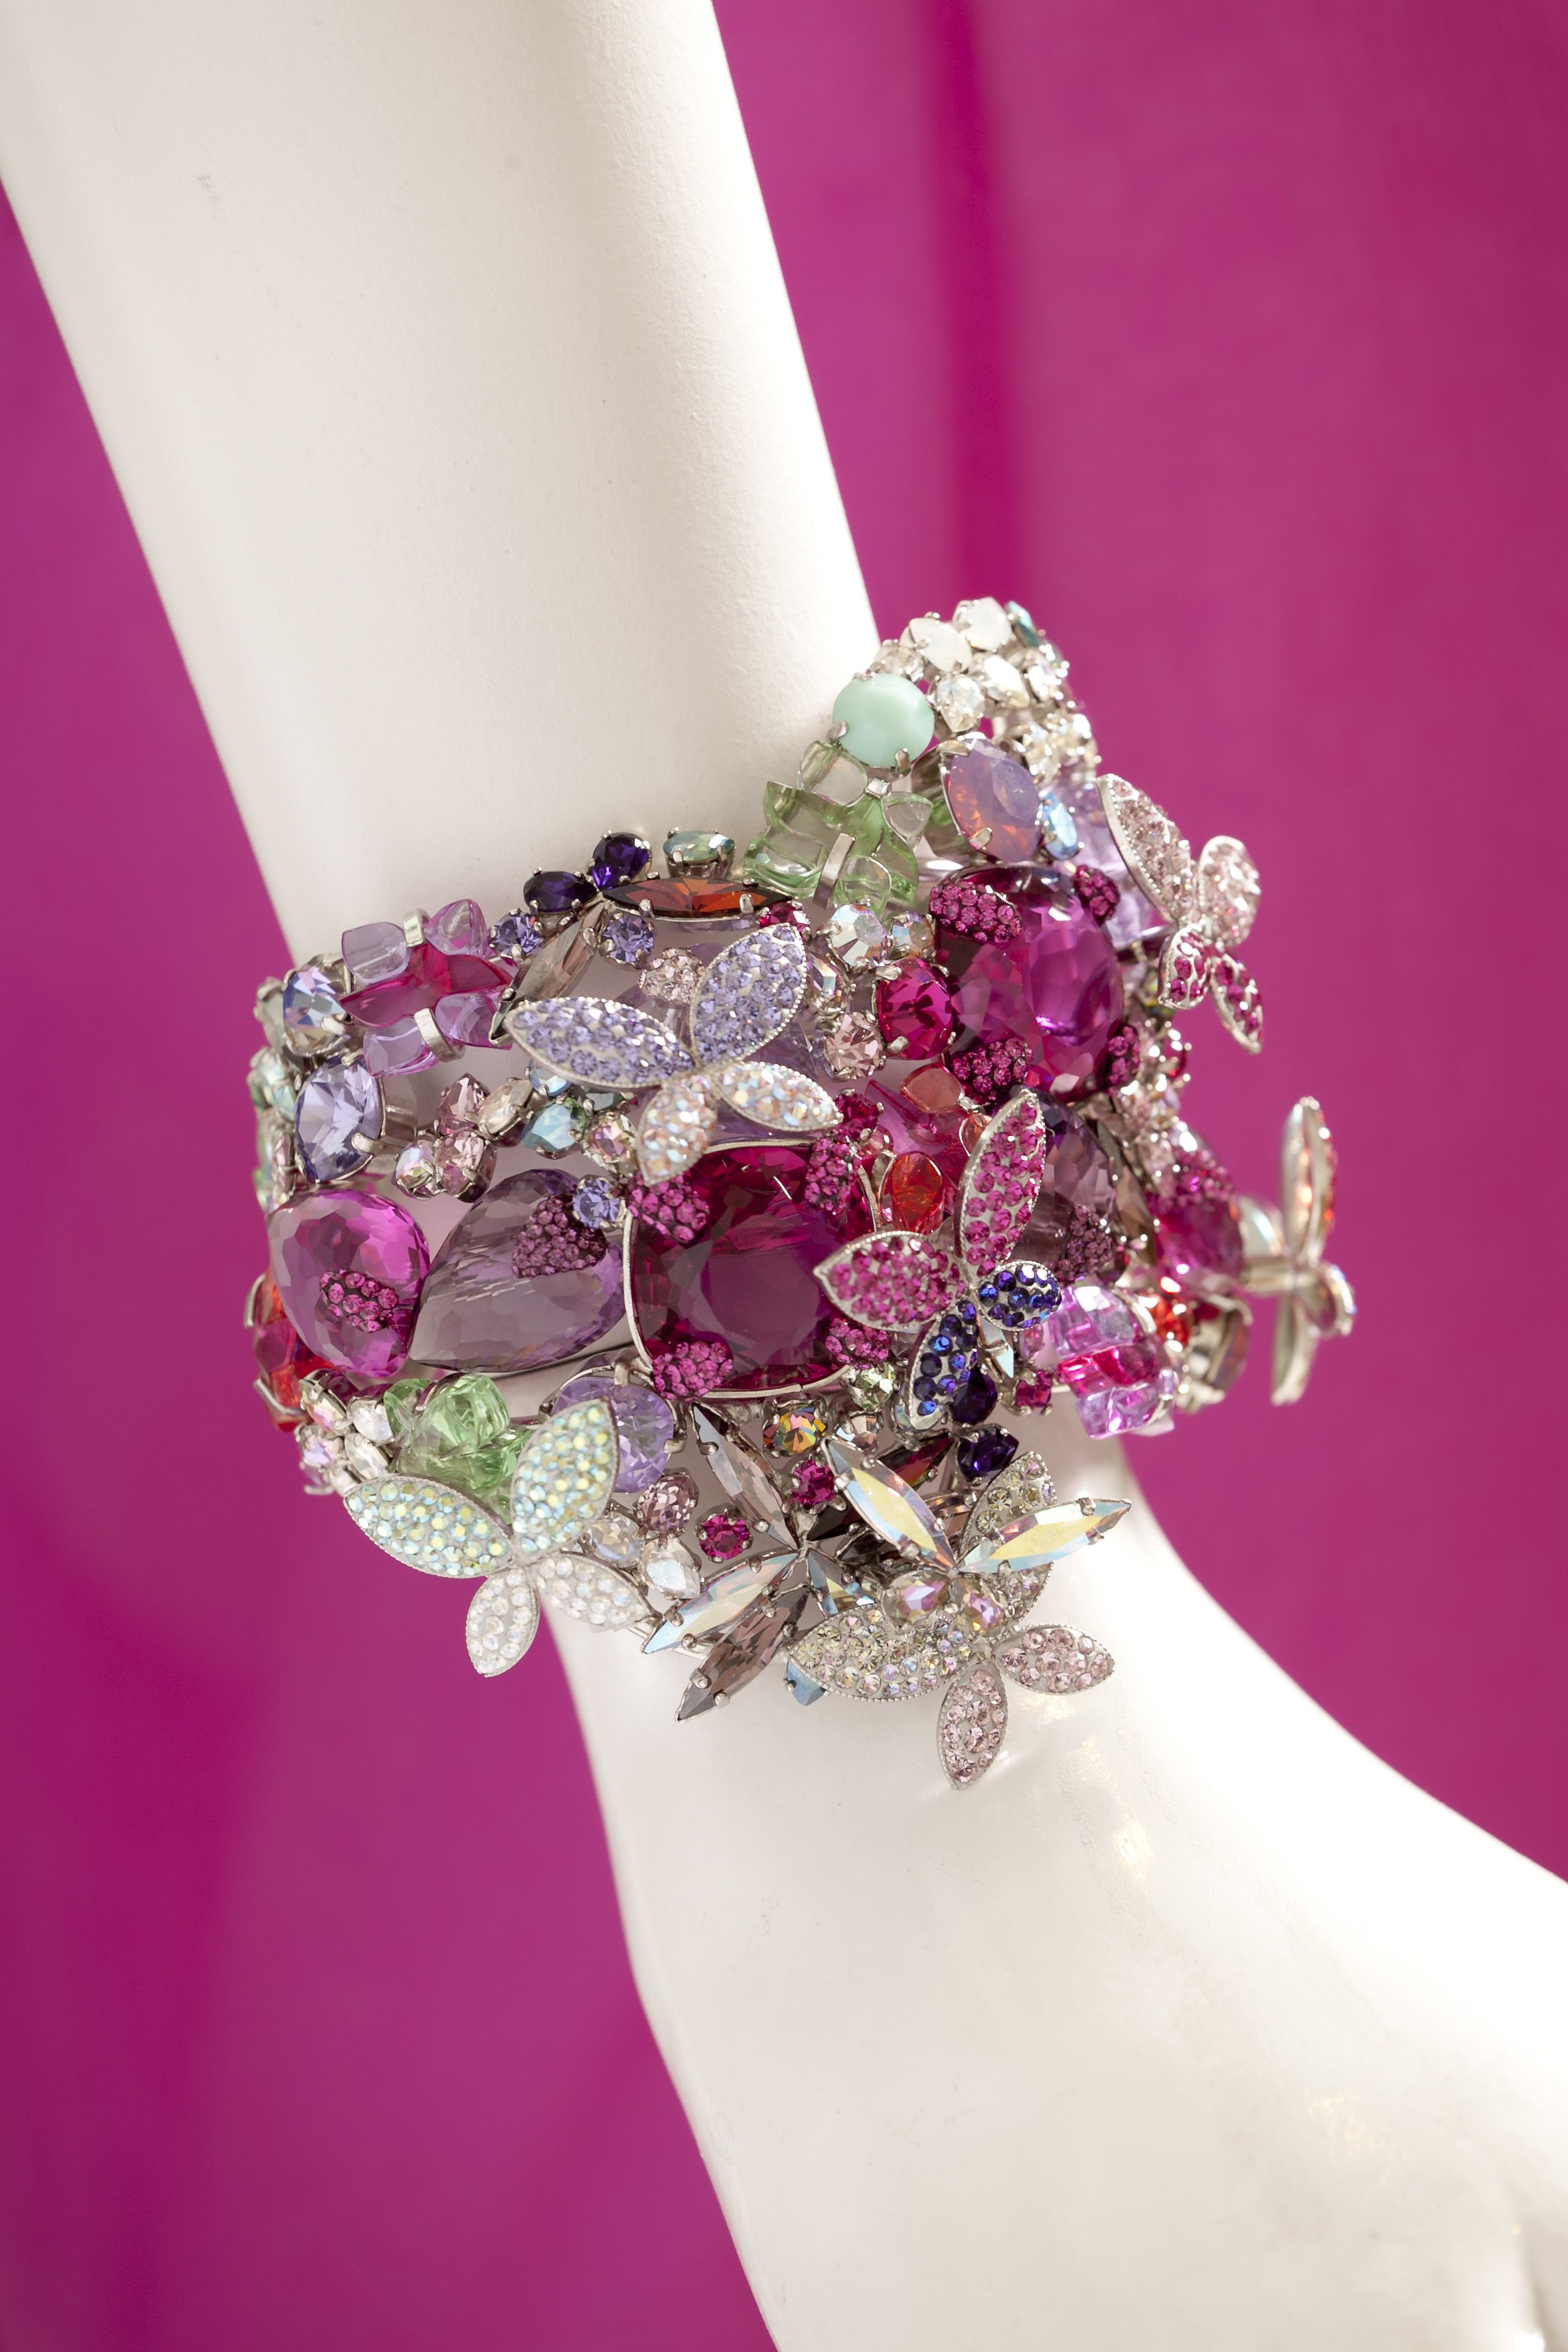 #fushia #jewelry #fushia #swarovski #archives  #EmmanuelNguyenNgoc